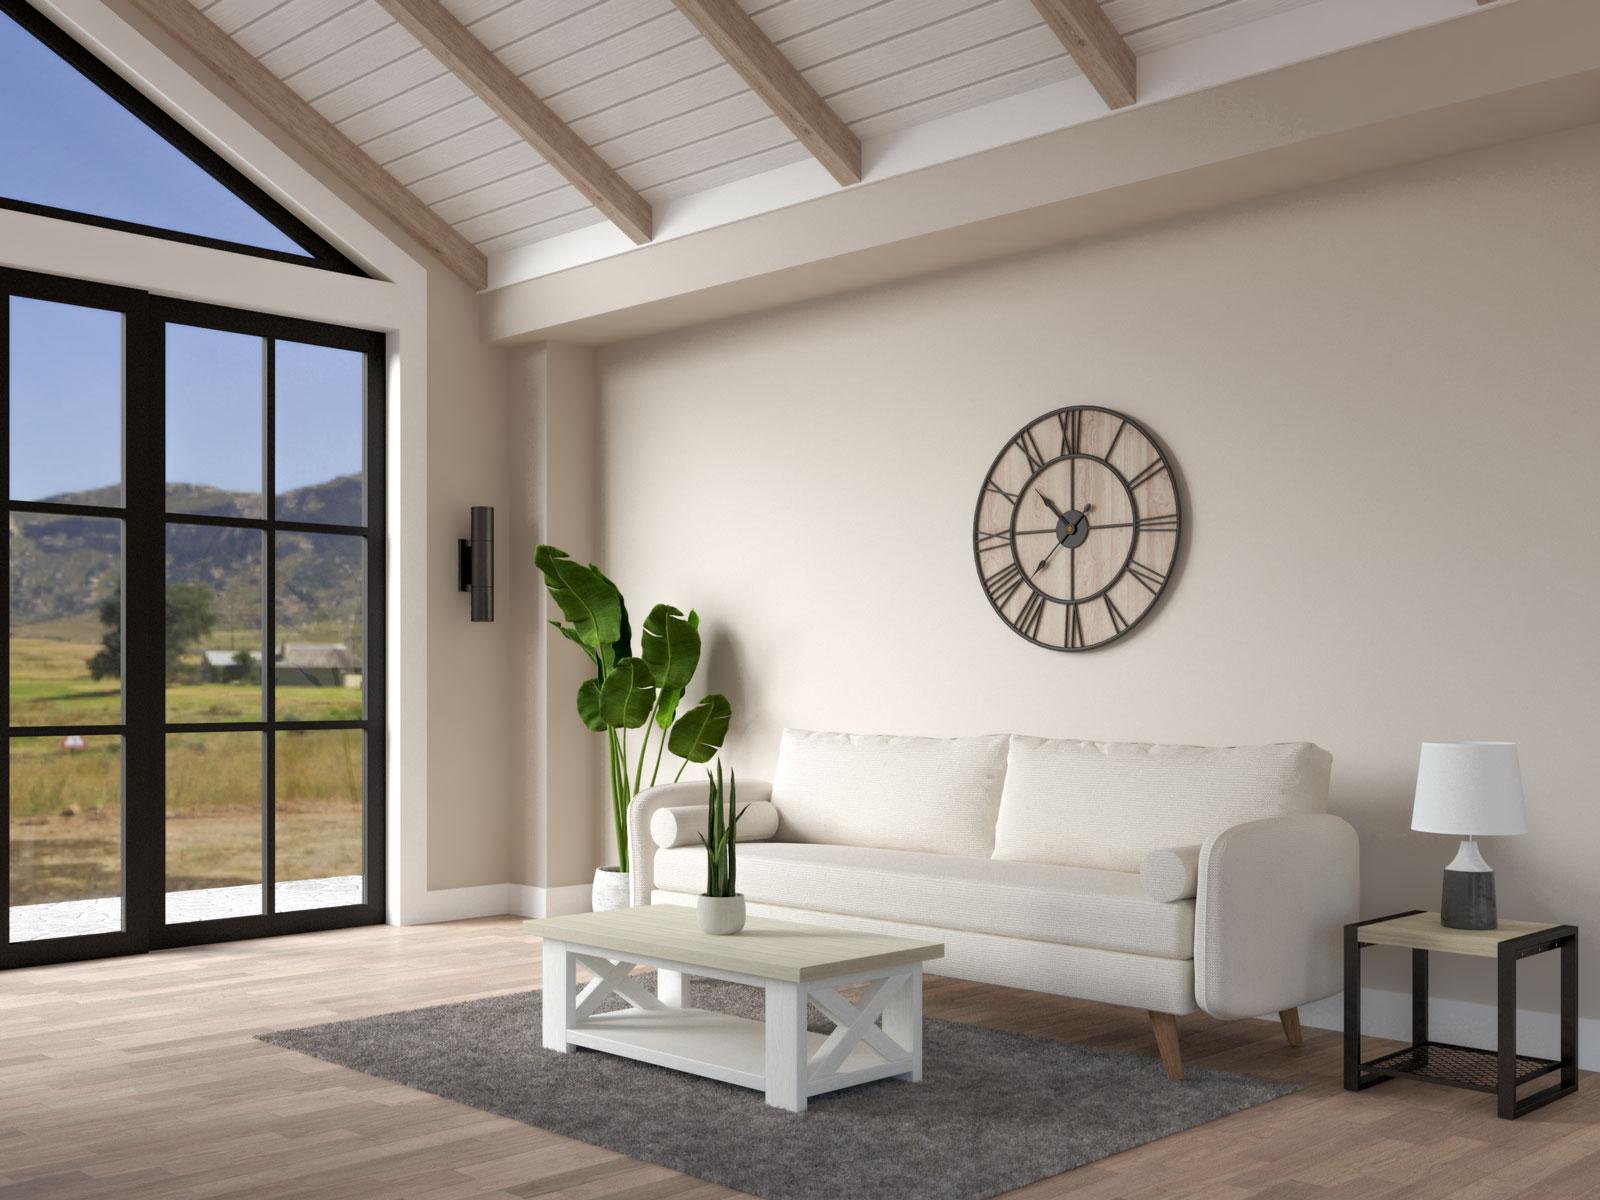 Wheat brown walls in modern farmhouse interior